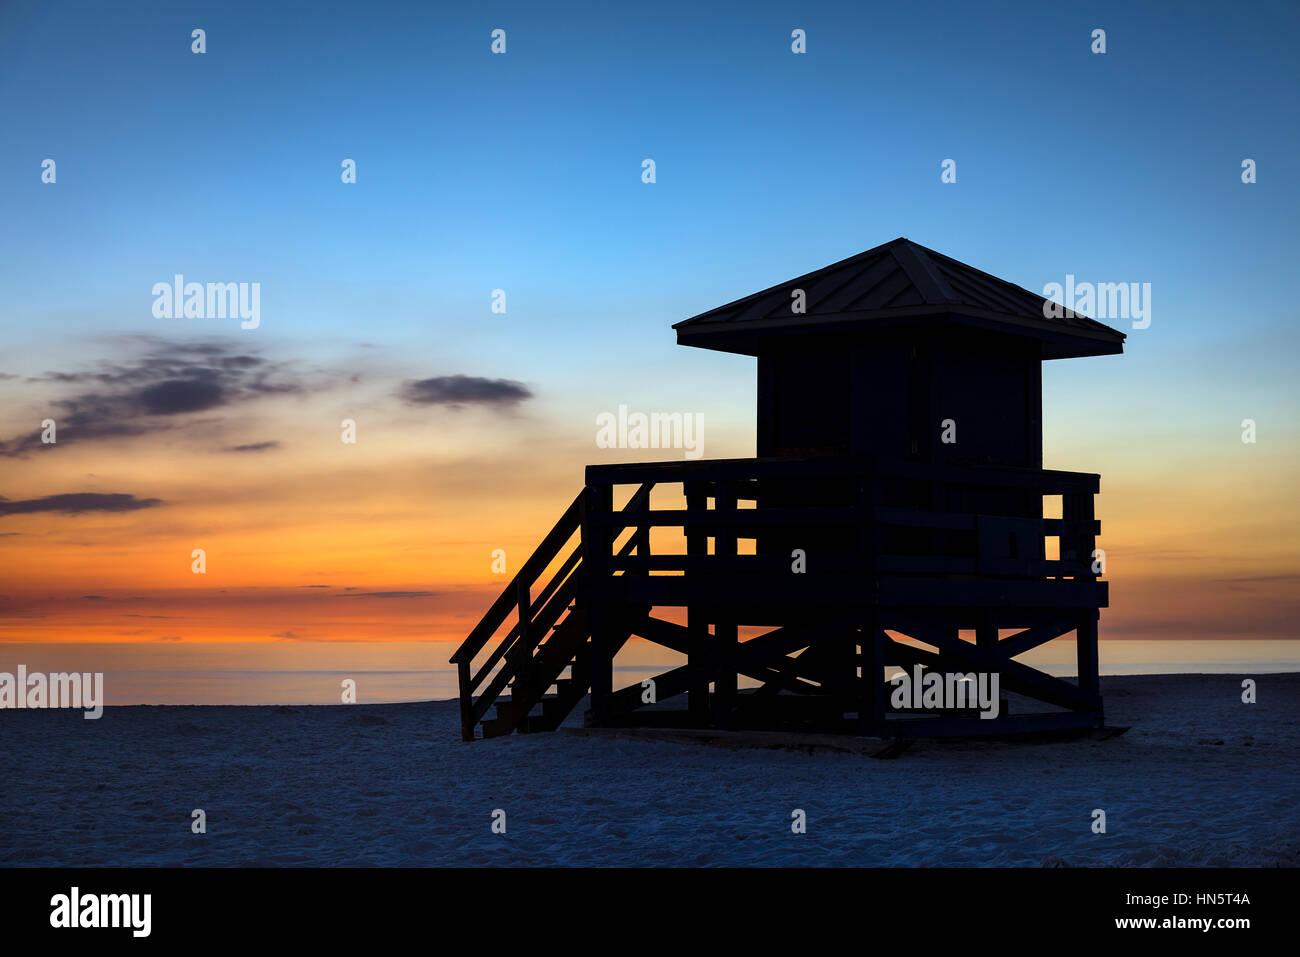 Lifeguard shack at sunset, Siesta Key Beach, Florida, USA. - Stock Image